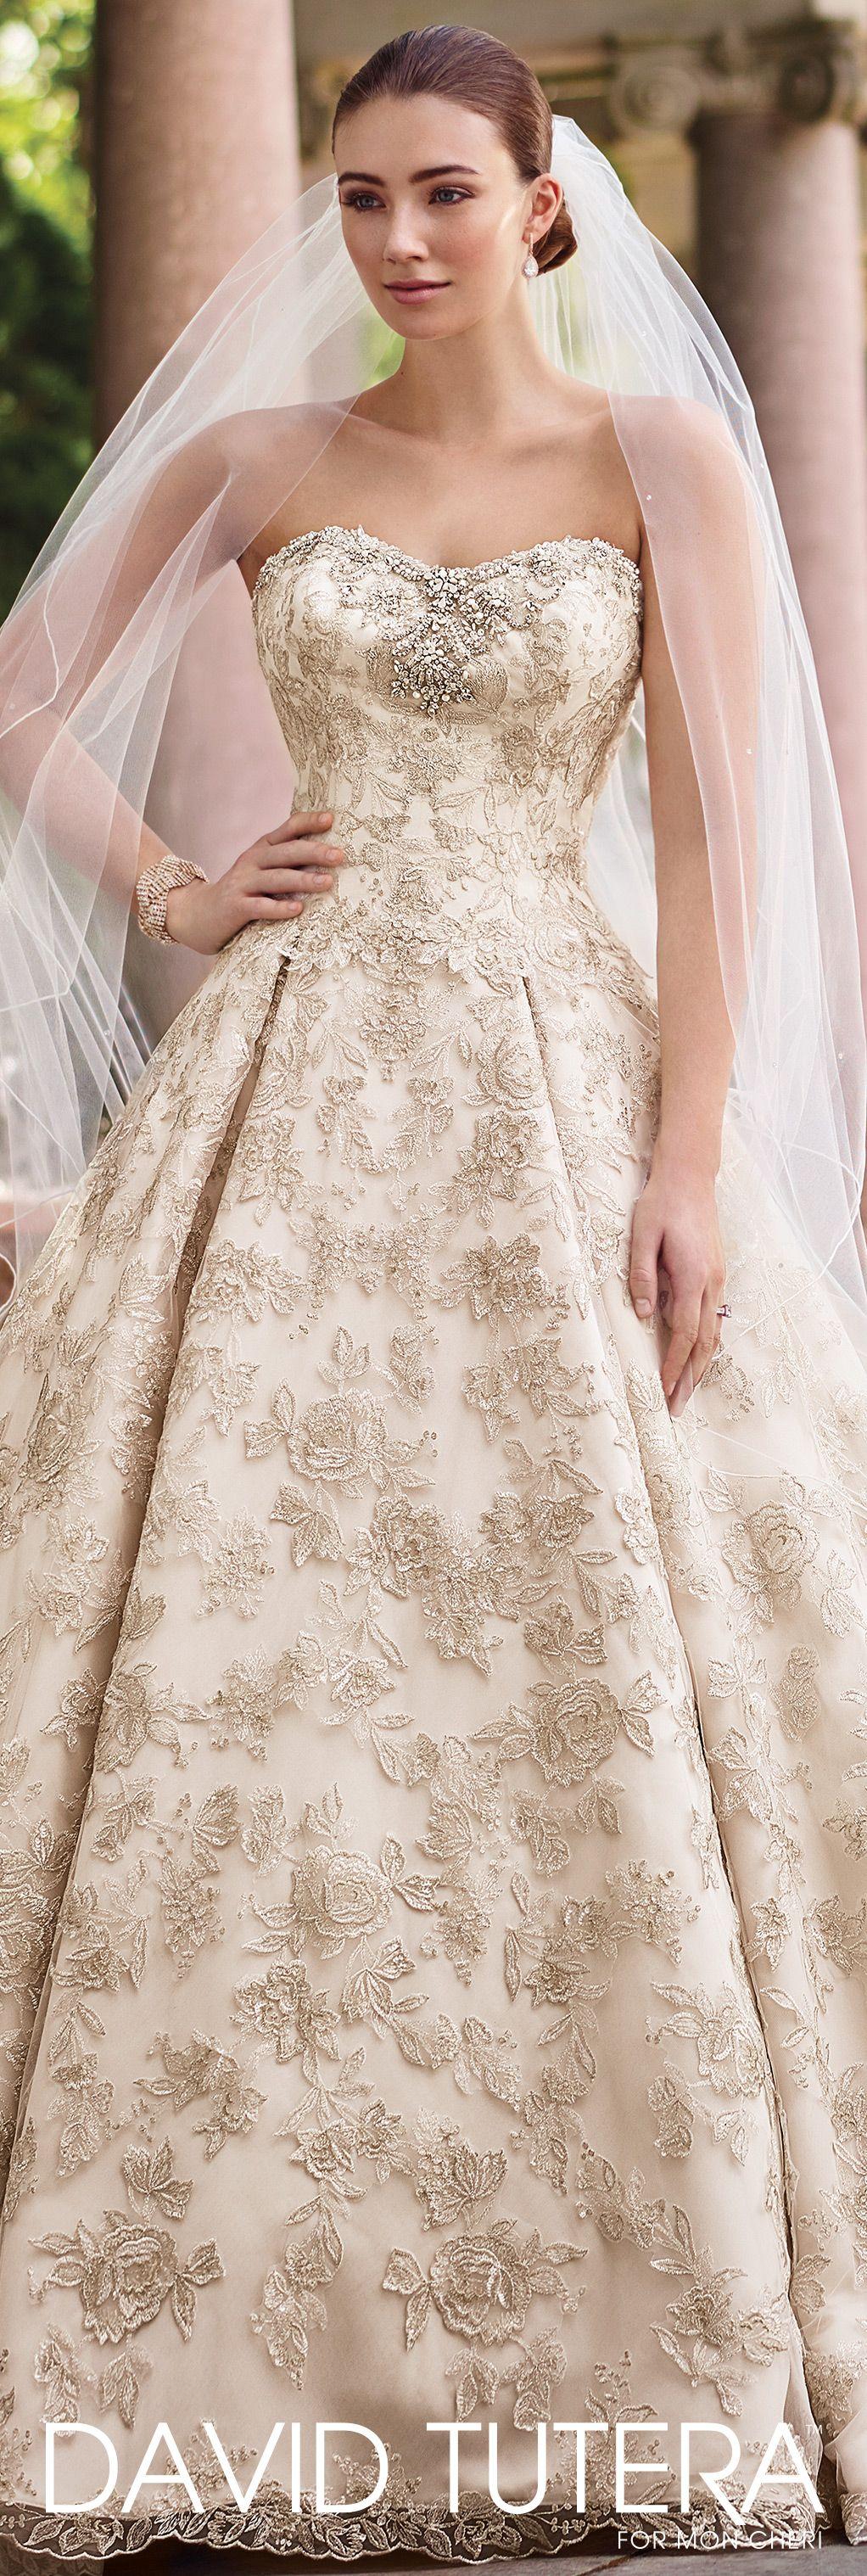 Wedding dress huntsville al  Rhea Pemberton rheapemberton on Pinterest